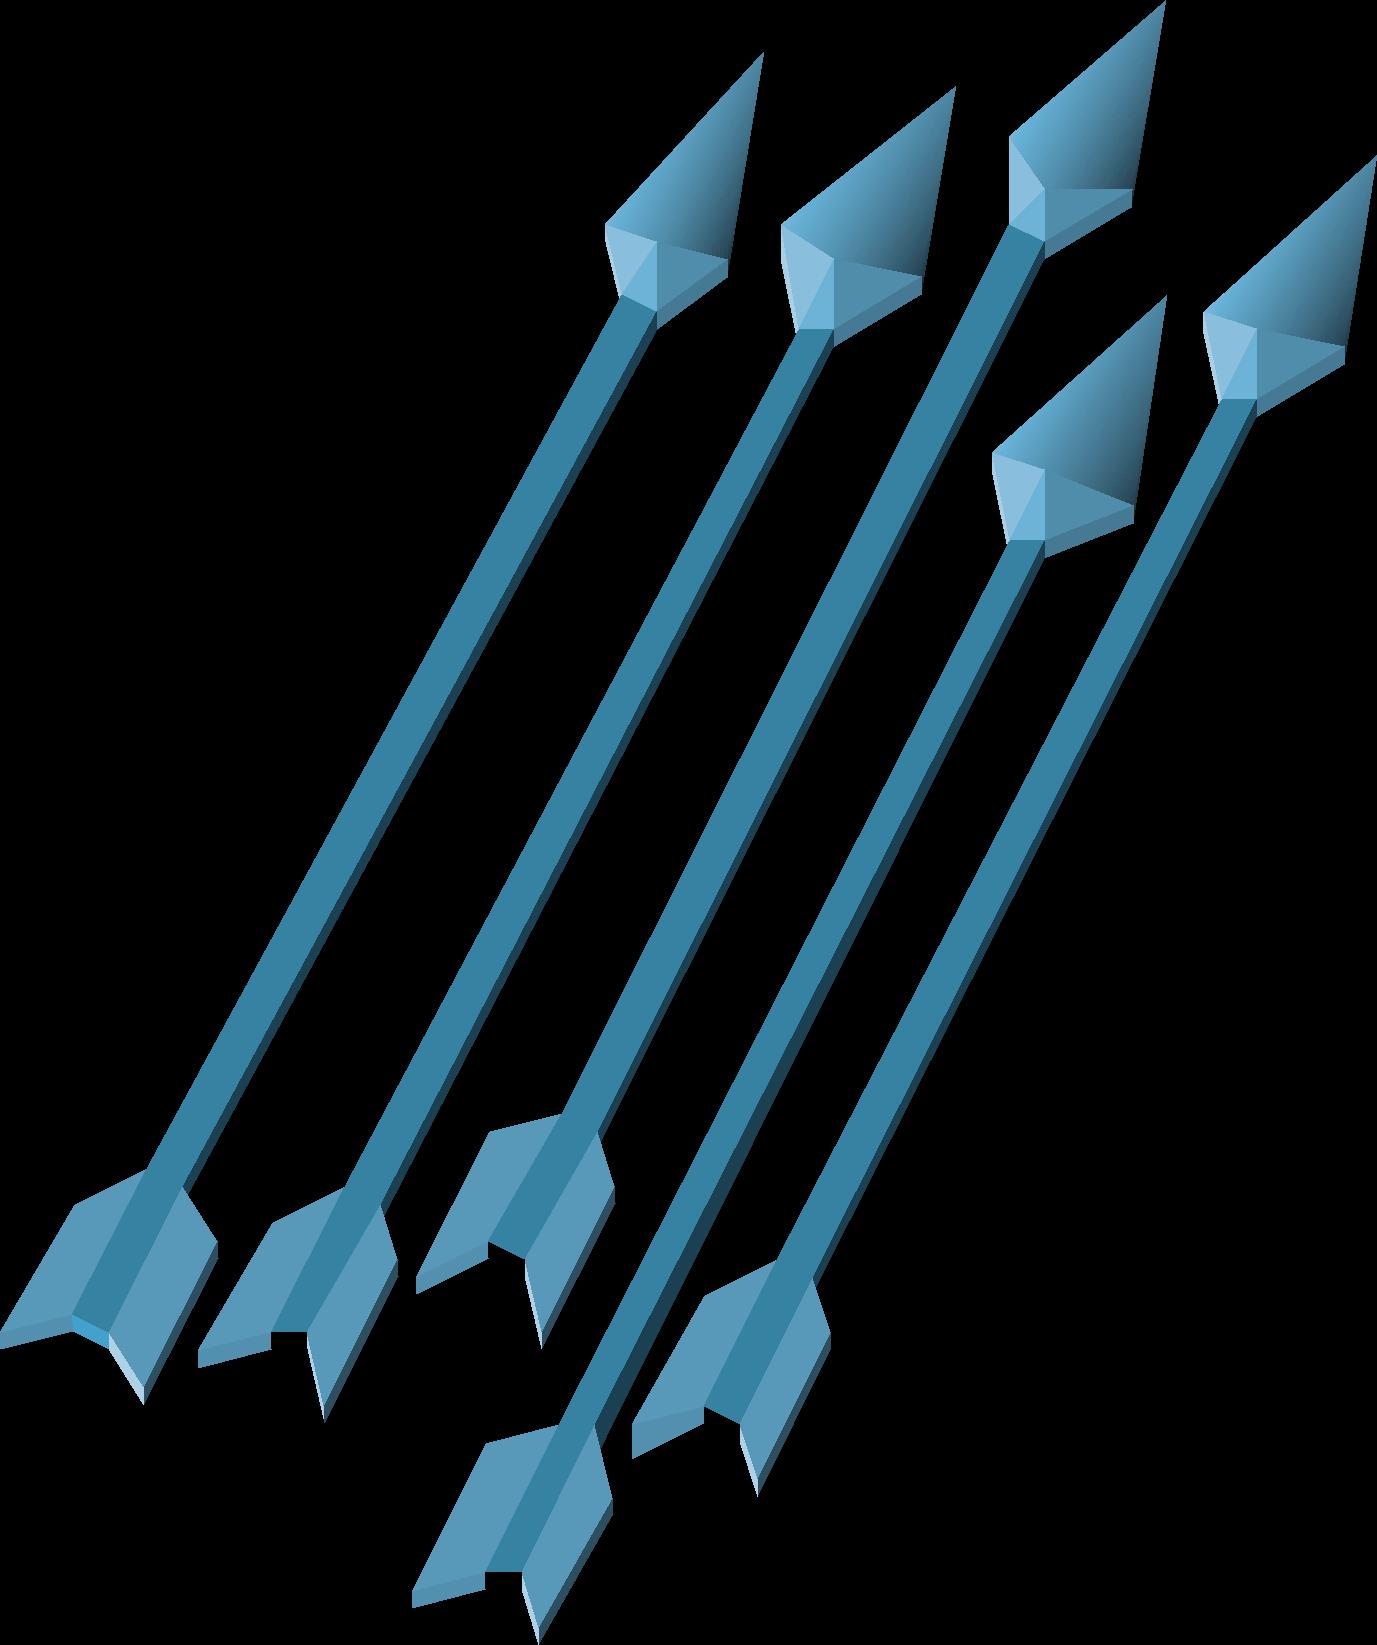 Ice arrows